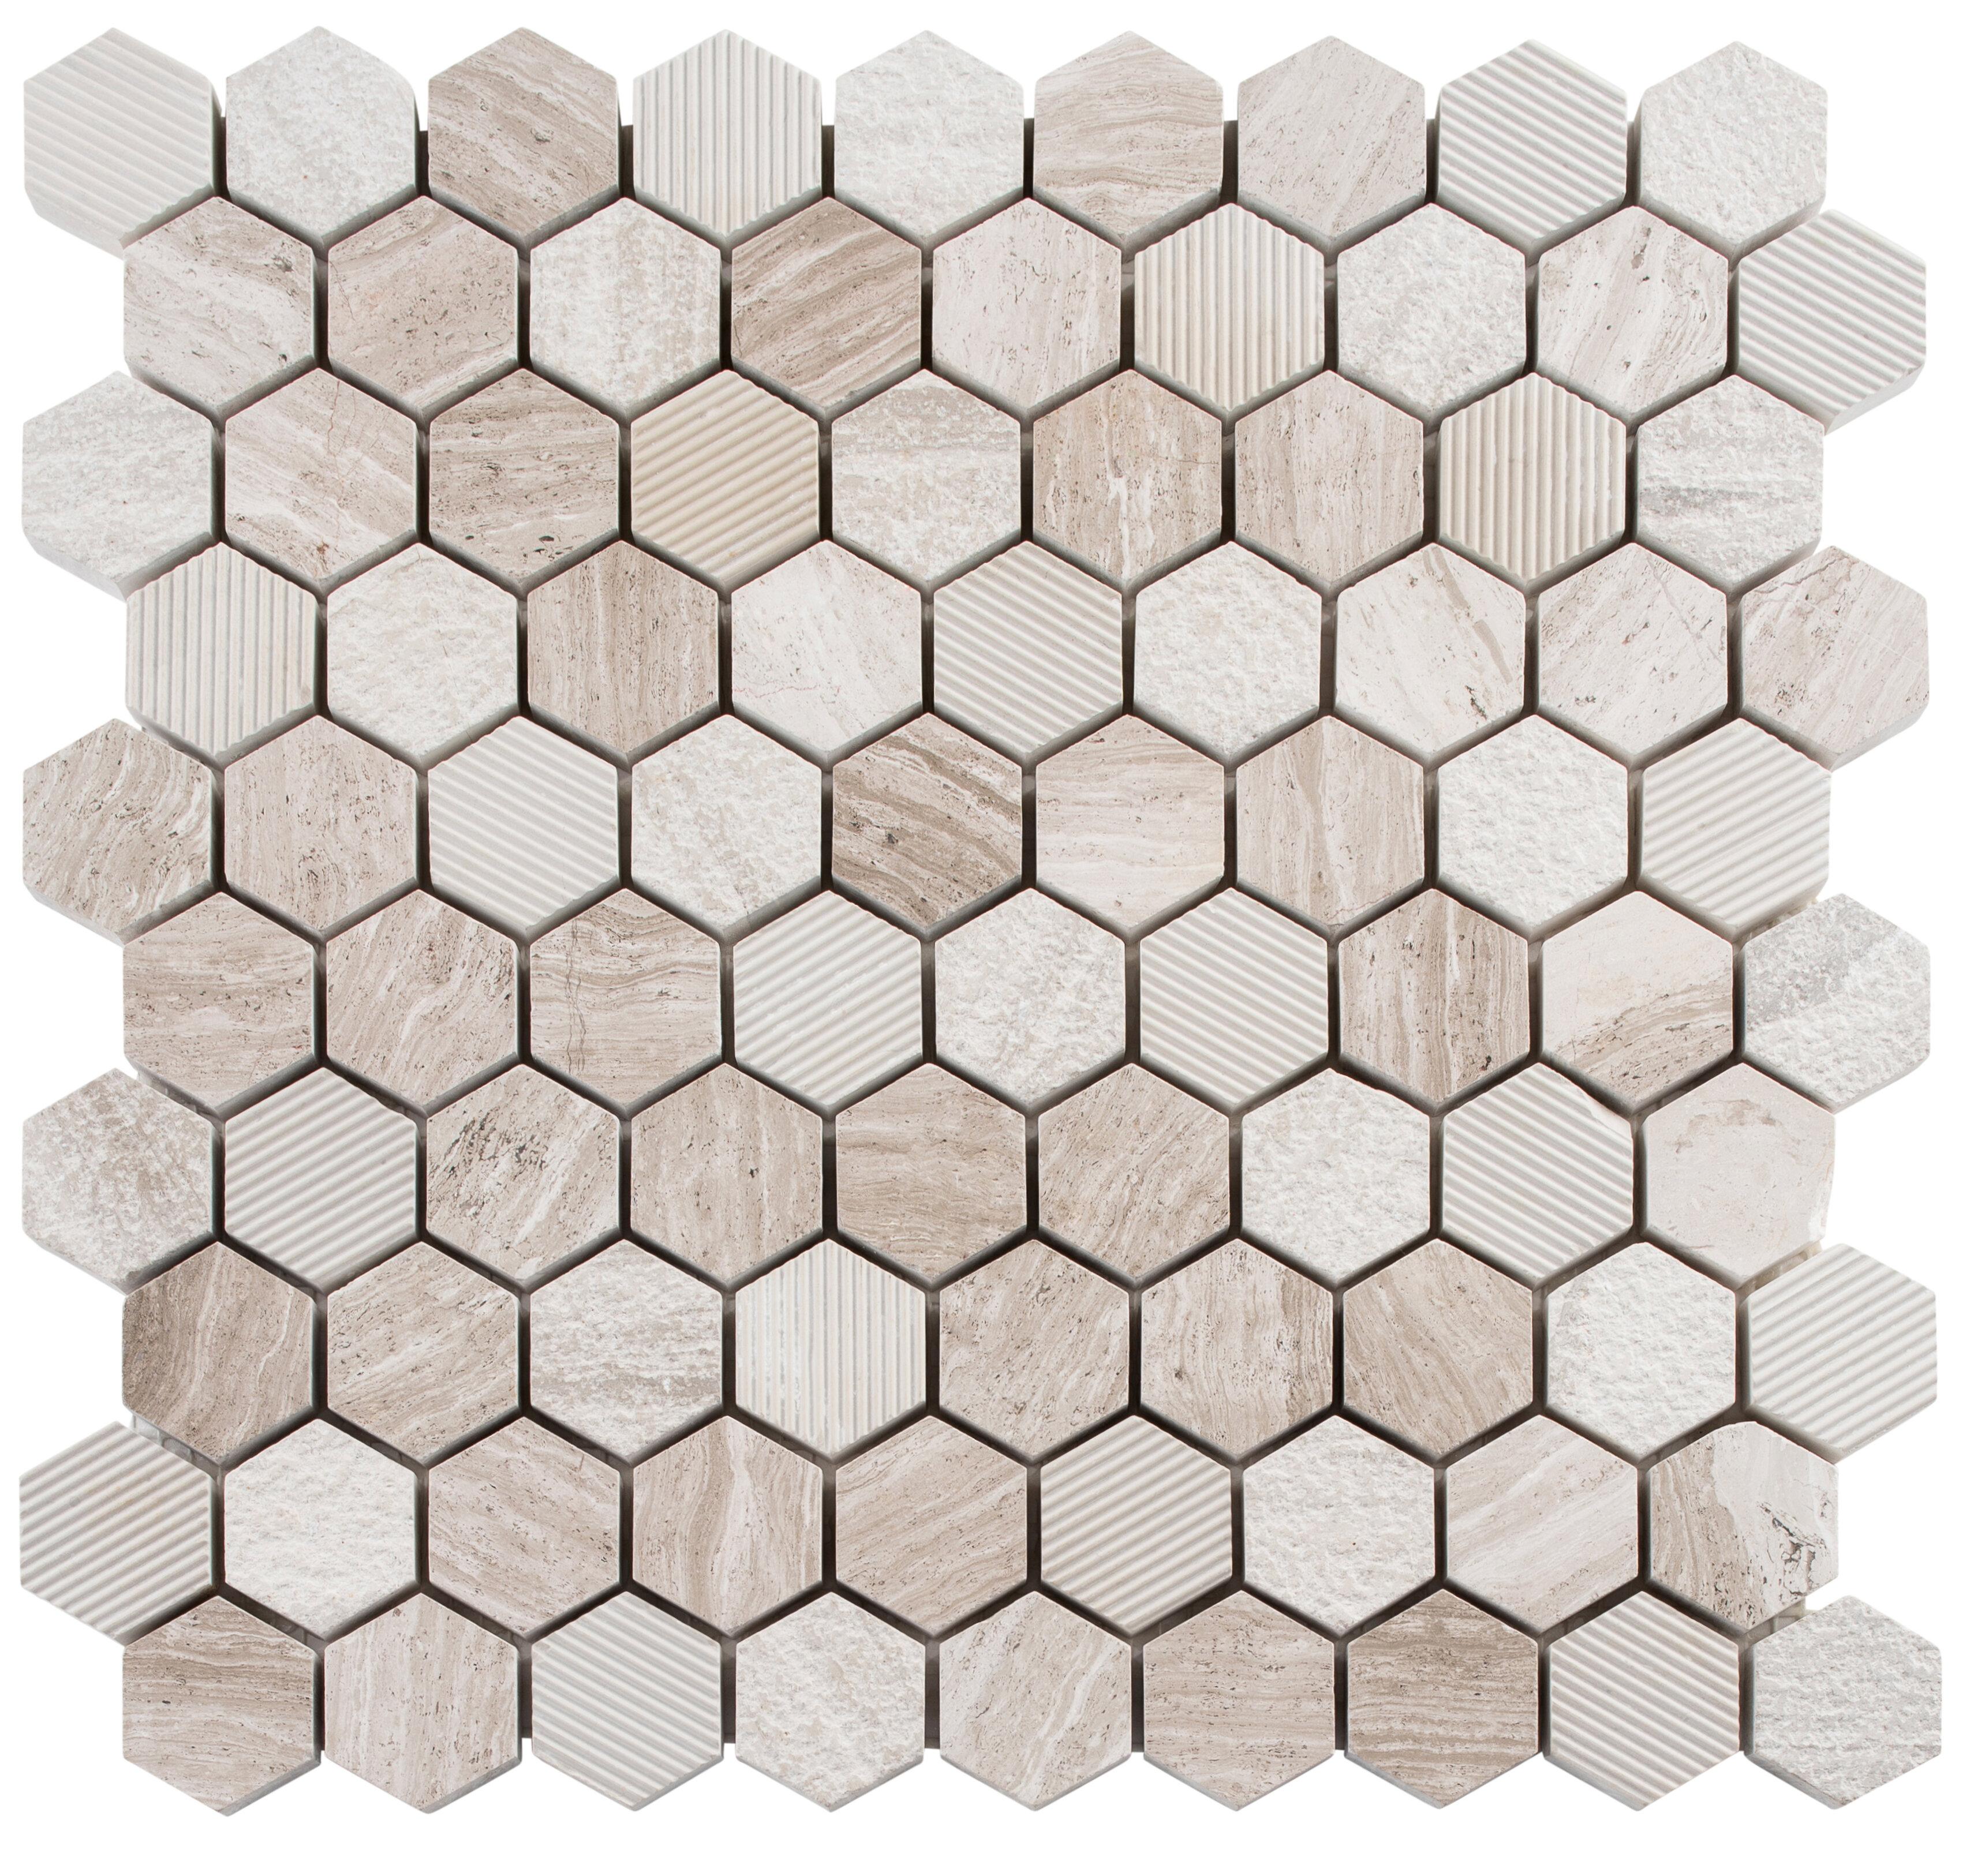 Andova Amarillo 1 25 X 1 25 Natural Stone Mosaic Tile Wayfair